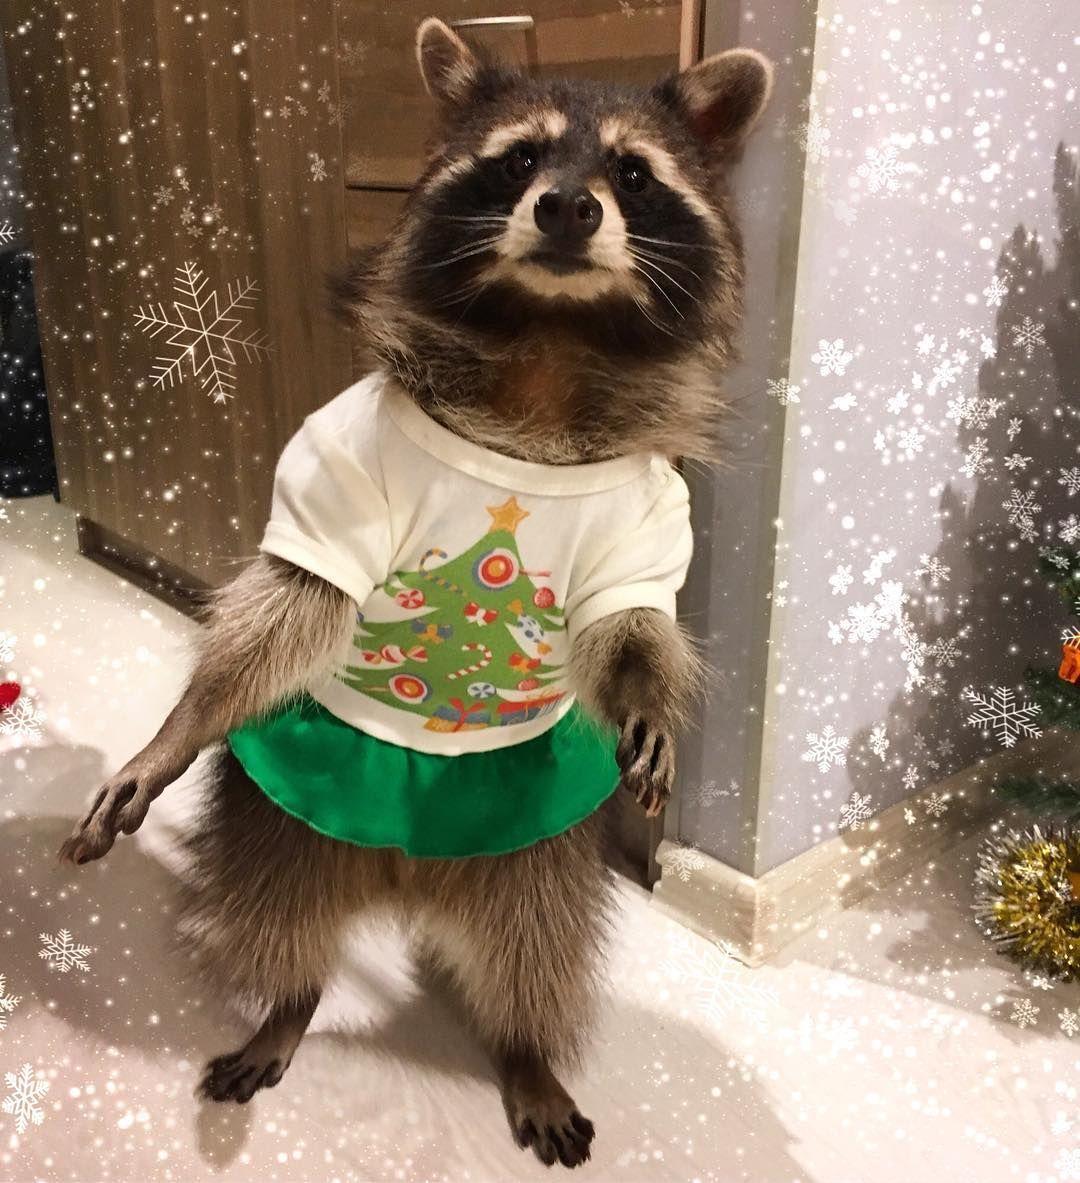 Pin by Raccoons on Raccoons Pet raccoon, Baby raccoon